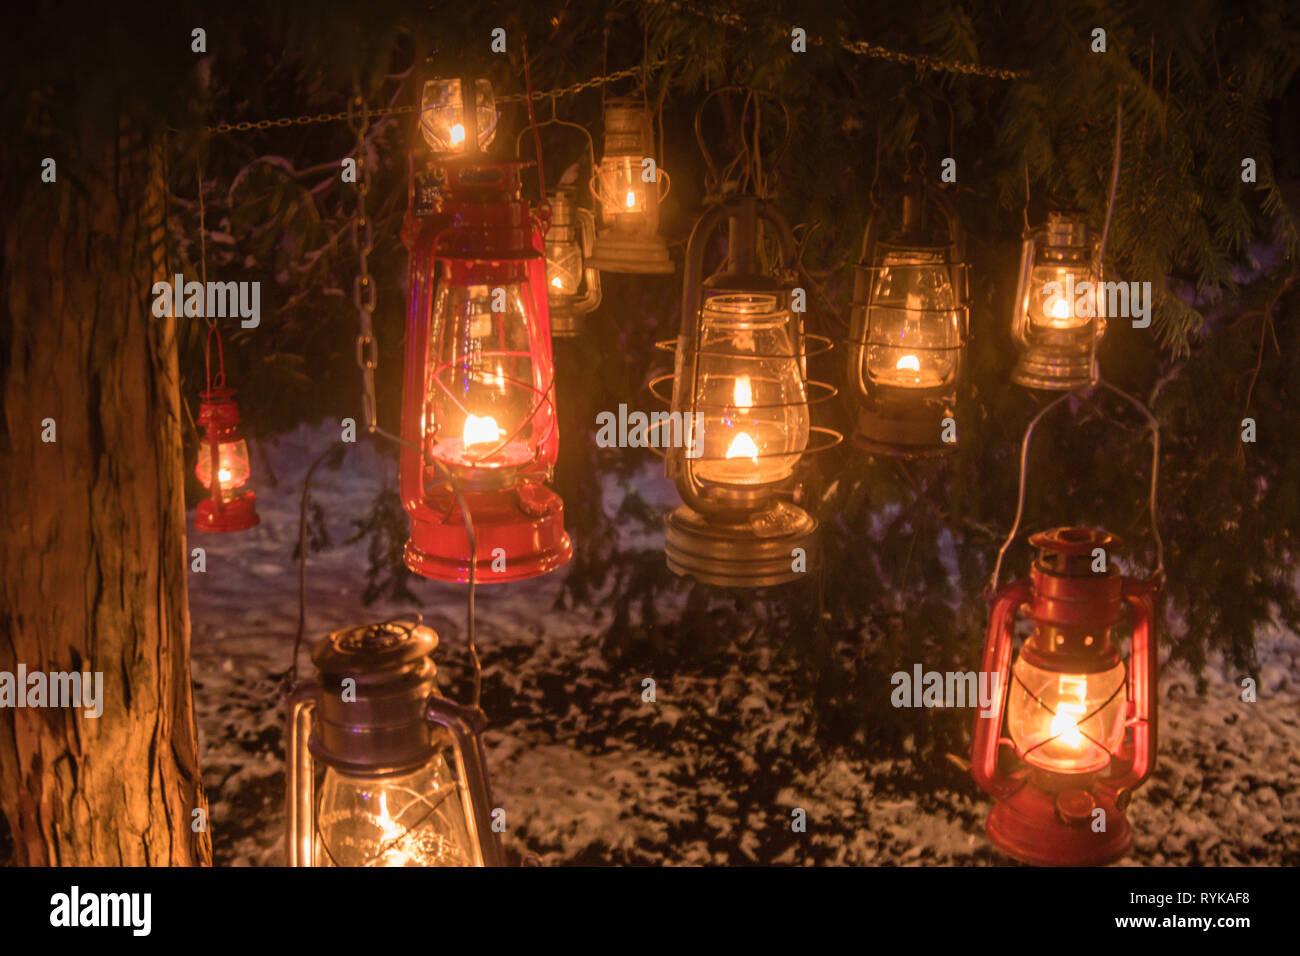 Coleman lanterne datant